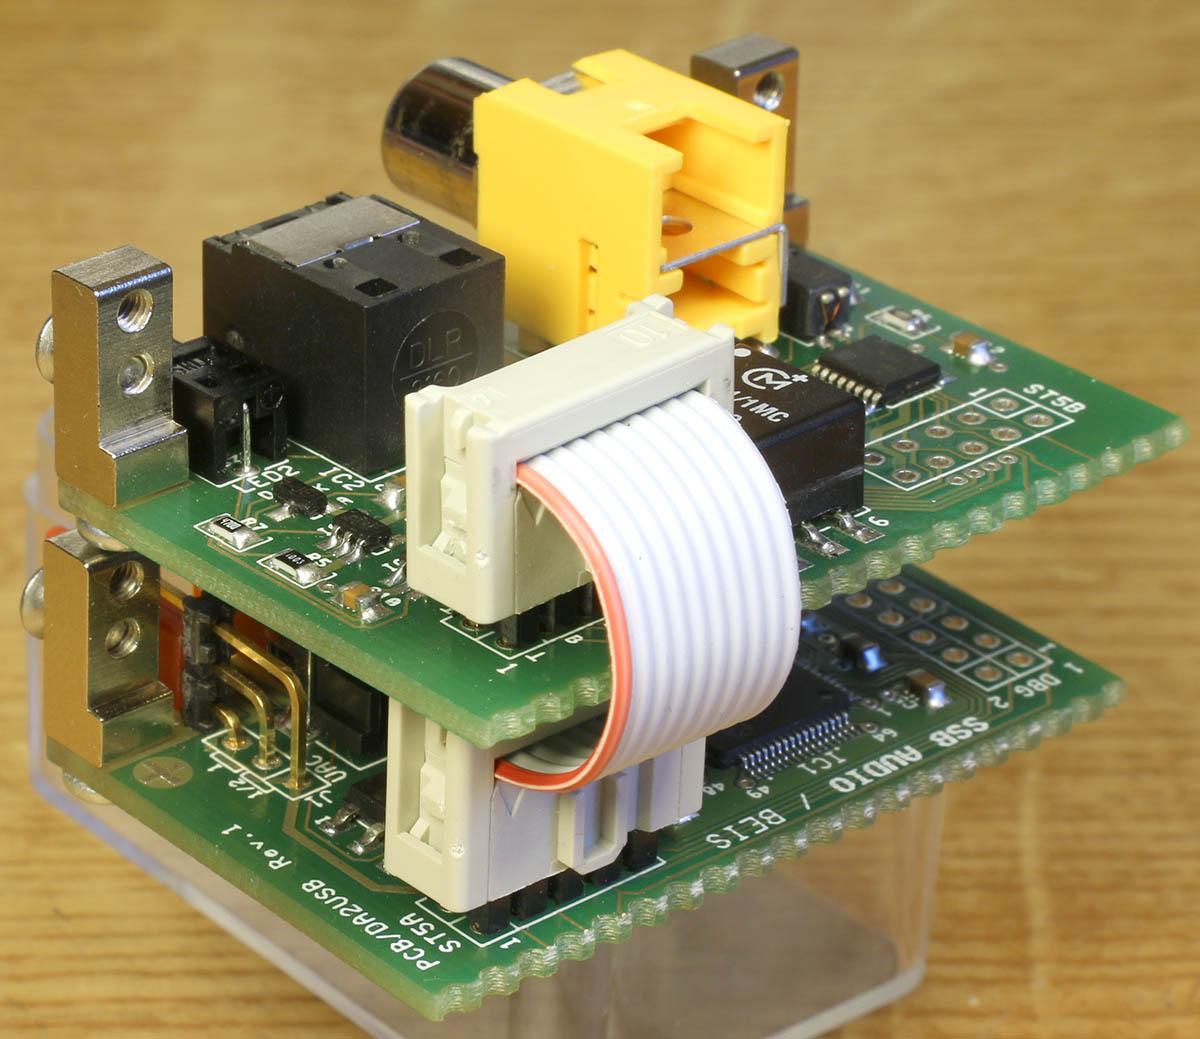 Da2usb Digital Audio To Usb Interface Pcs Blank Universal Pcb Diy Circuit Board 8 X 12 Cm For Electronic Stacked